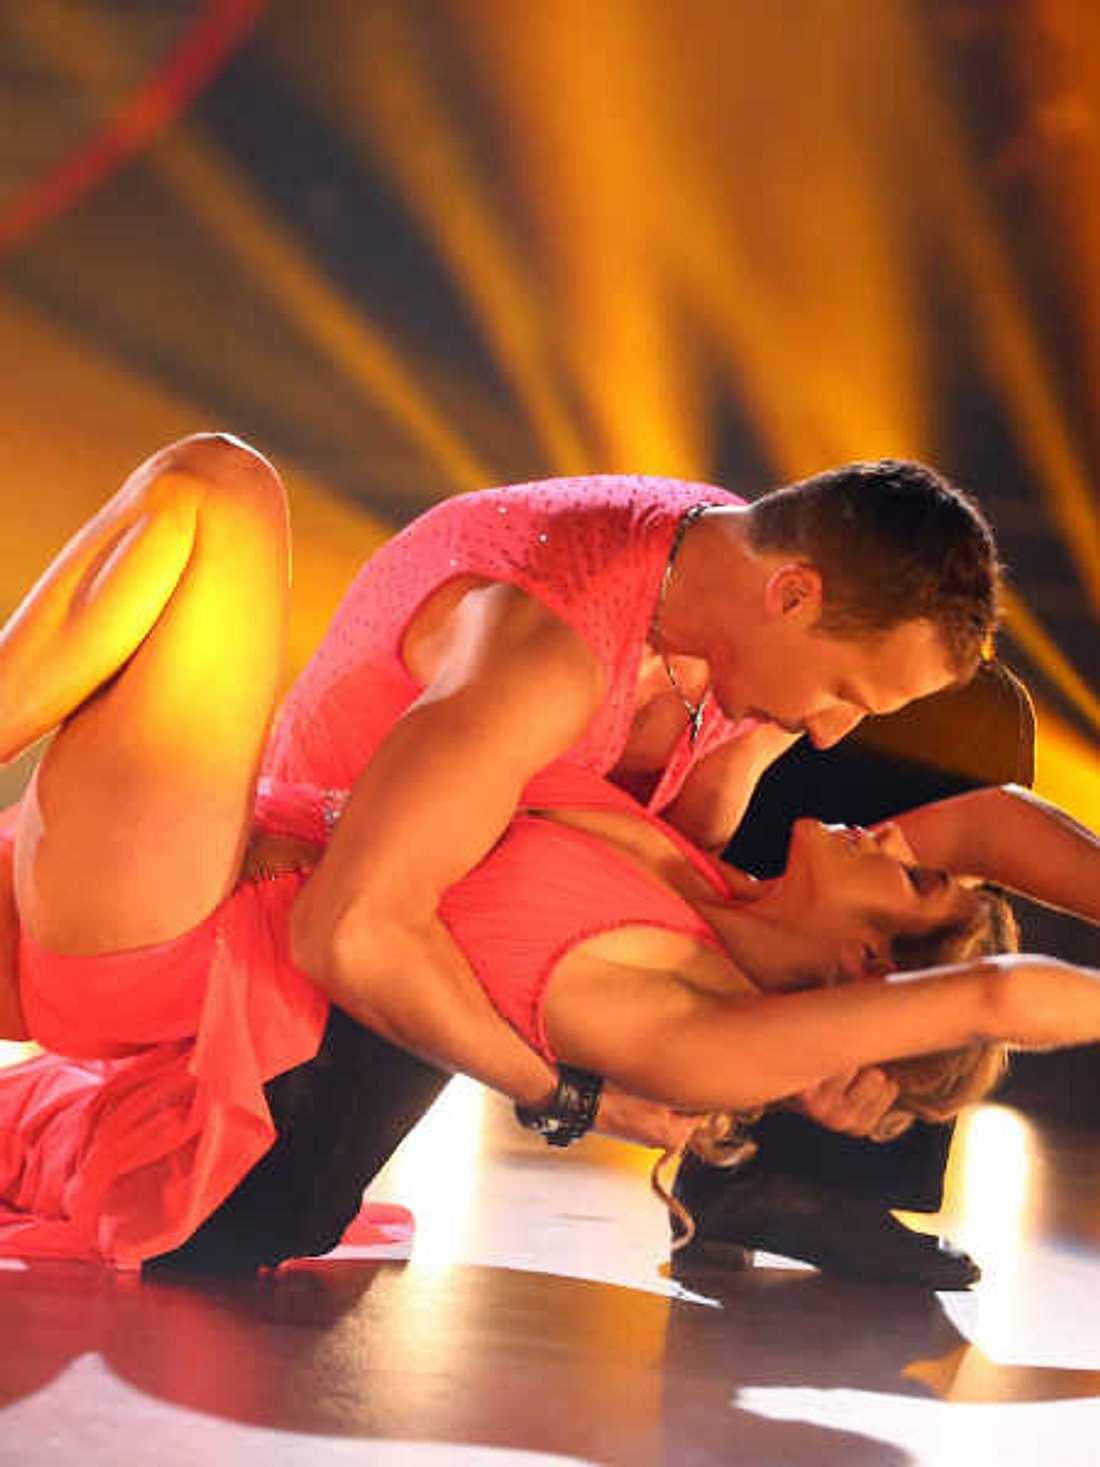 Panagiota Petridou will ihrem Tanz-Partner nicht nahe kommen.